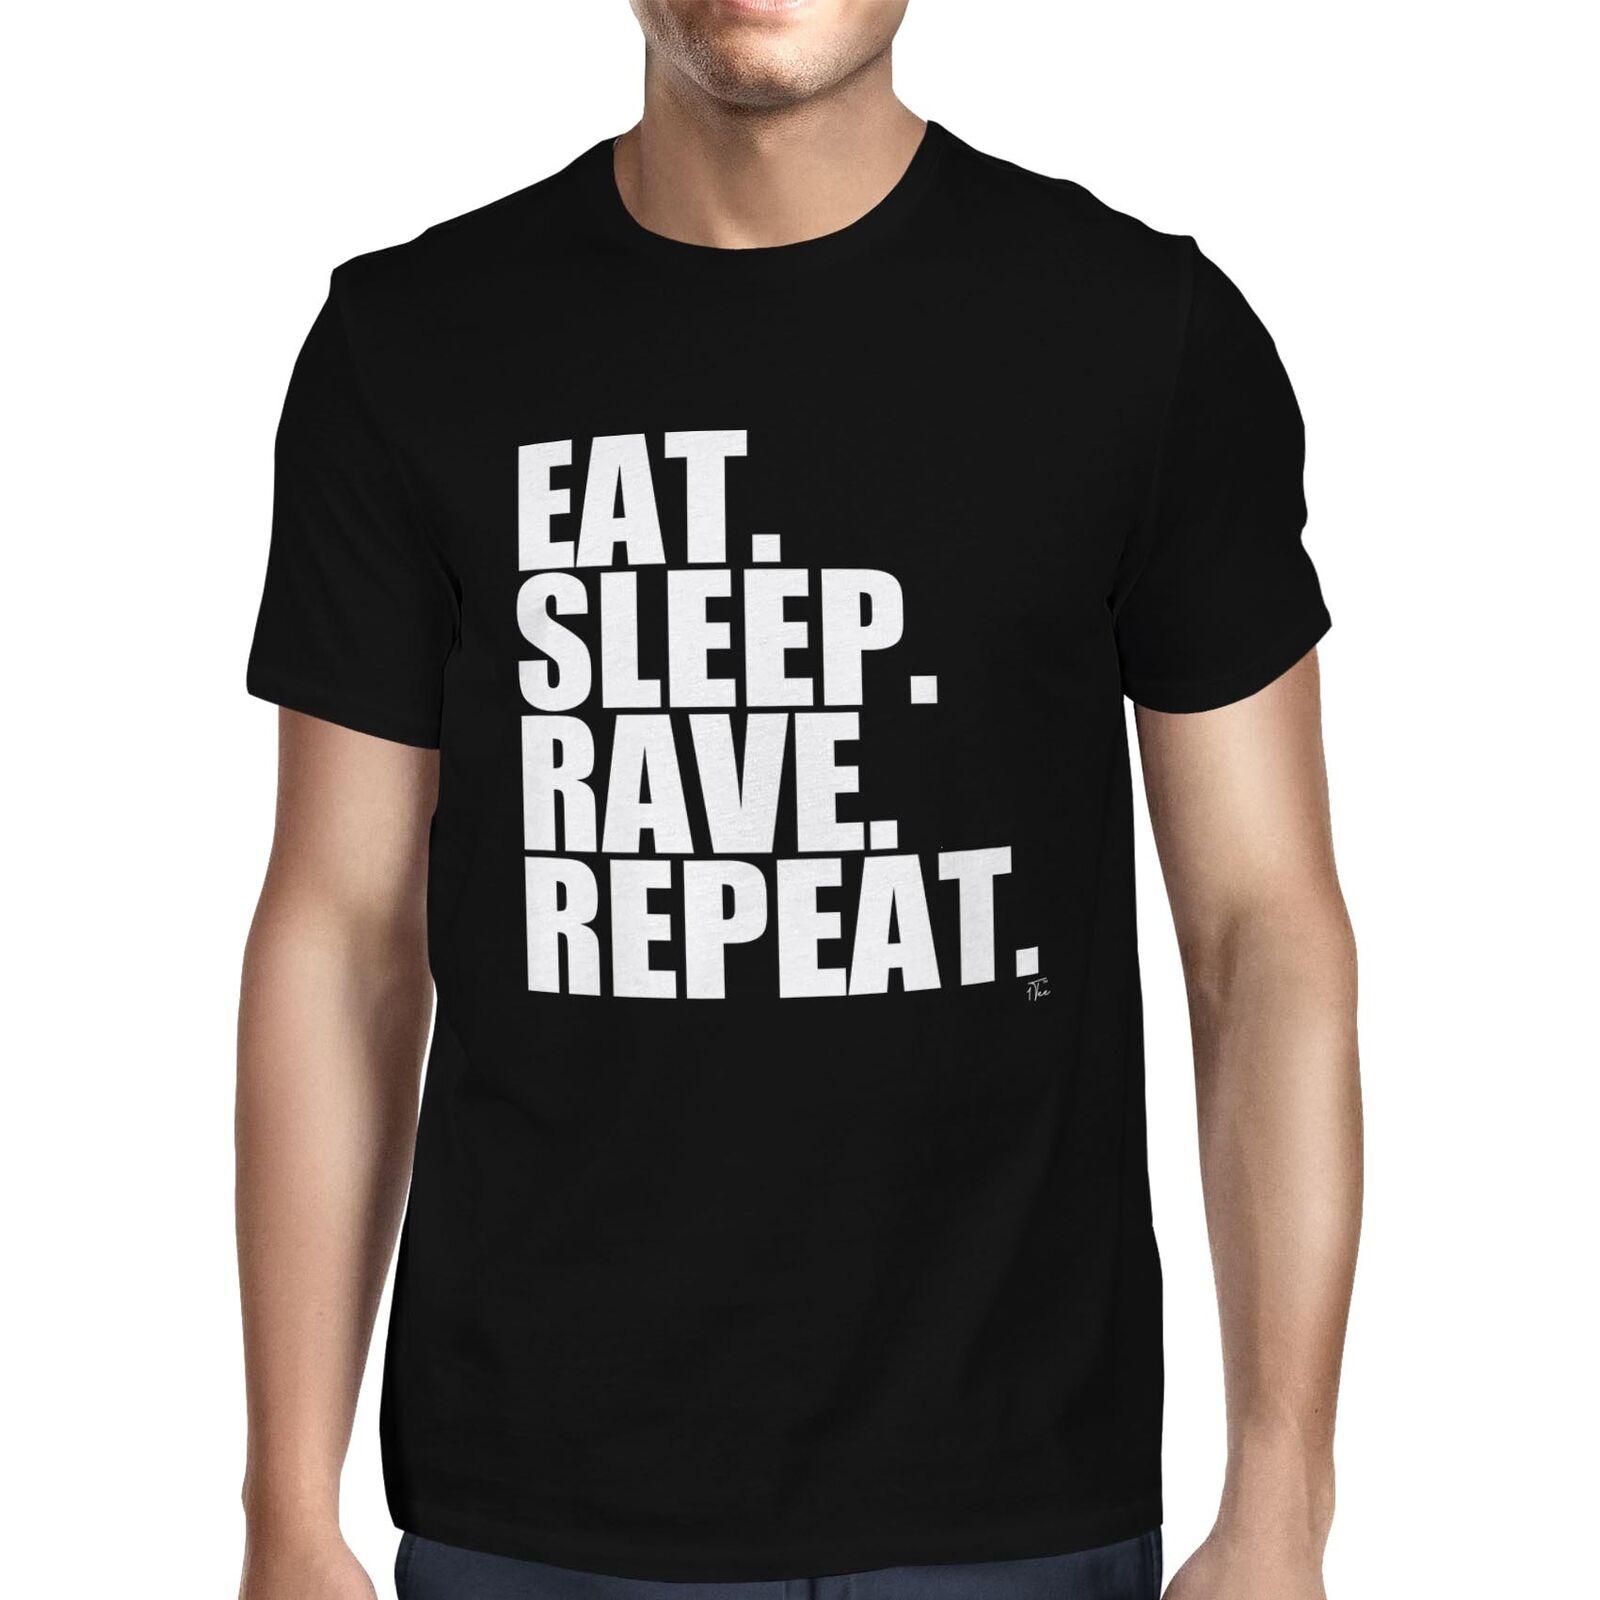 1t homens comer sono rave repetir t camisa